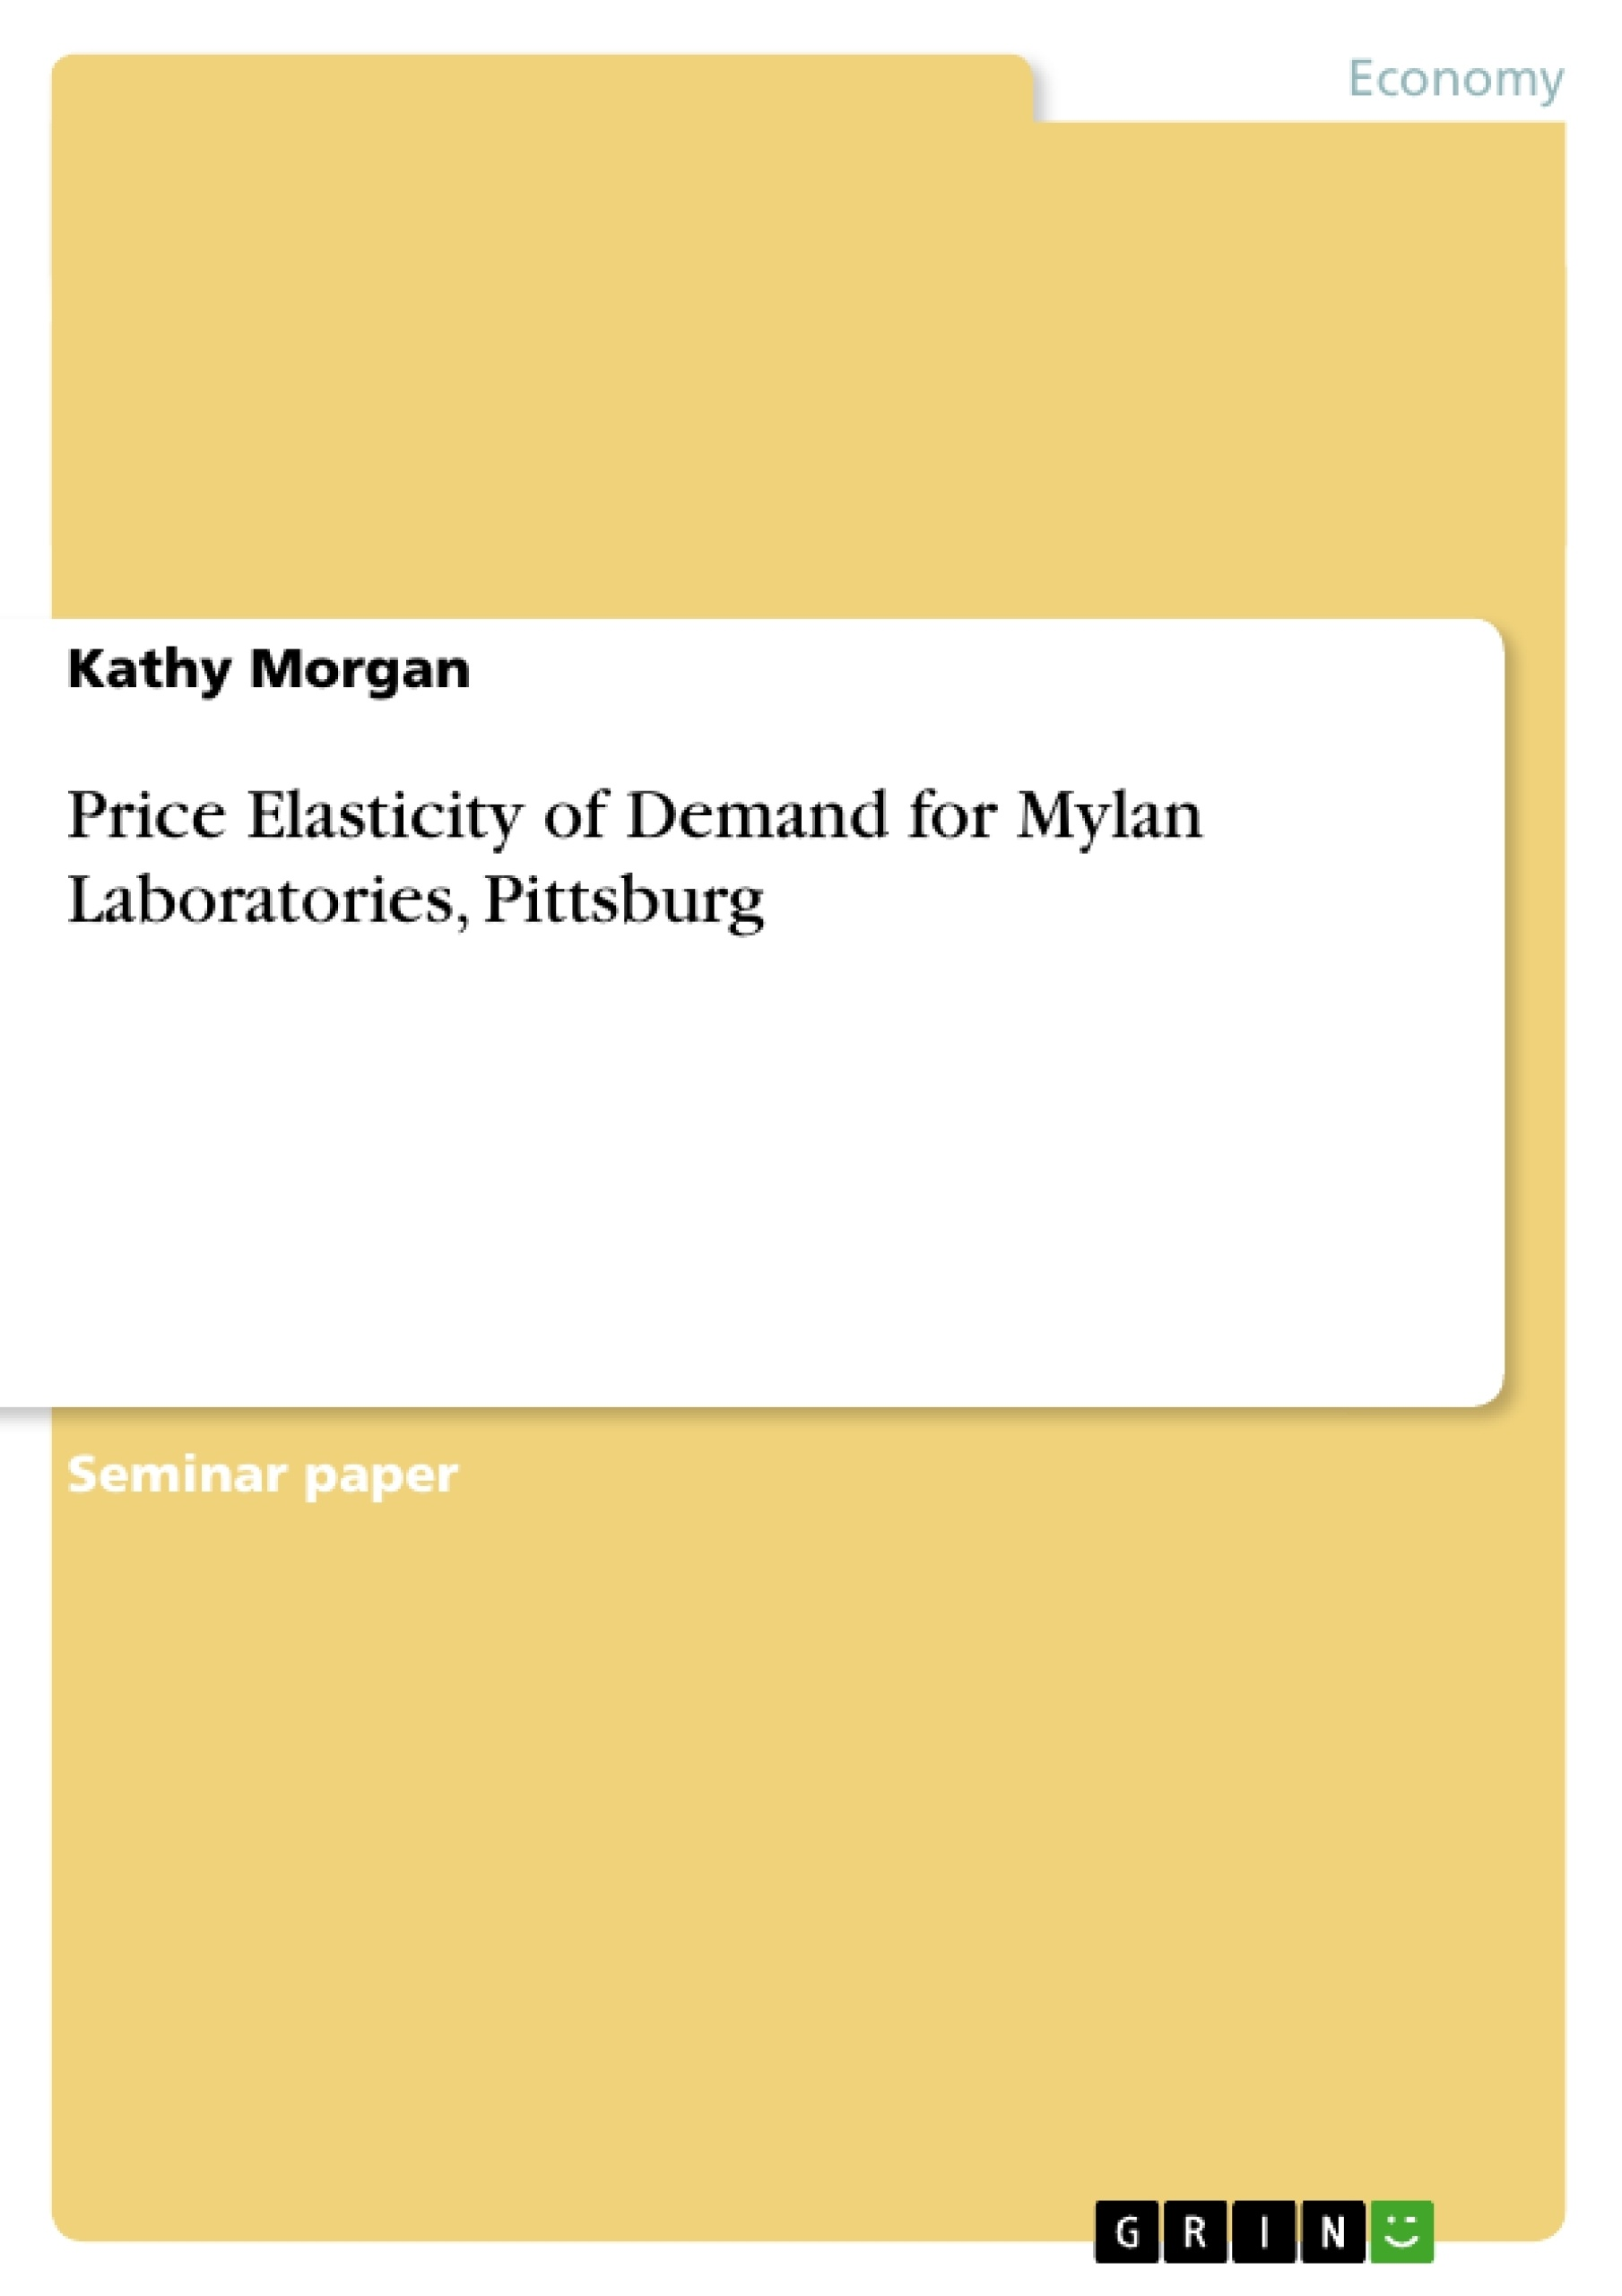 Title: Price Elasticity of Demand for Mylan Laboratories, Pittsburg